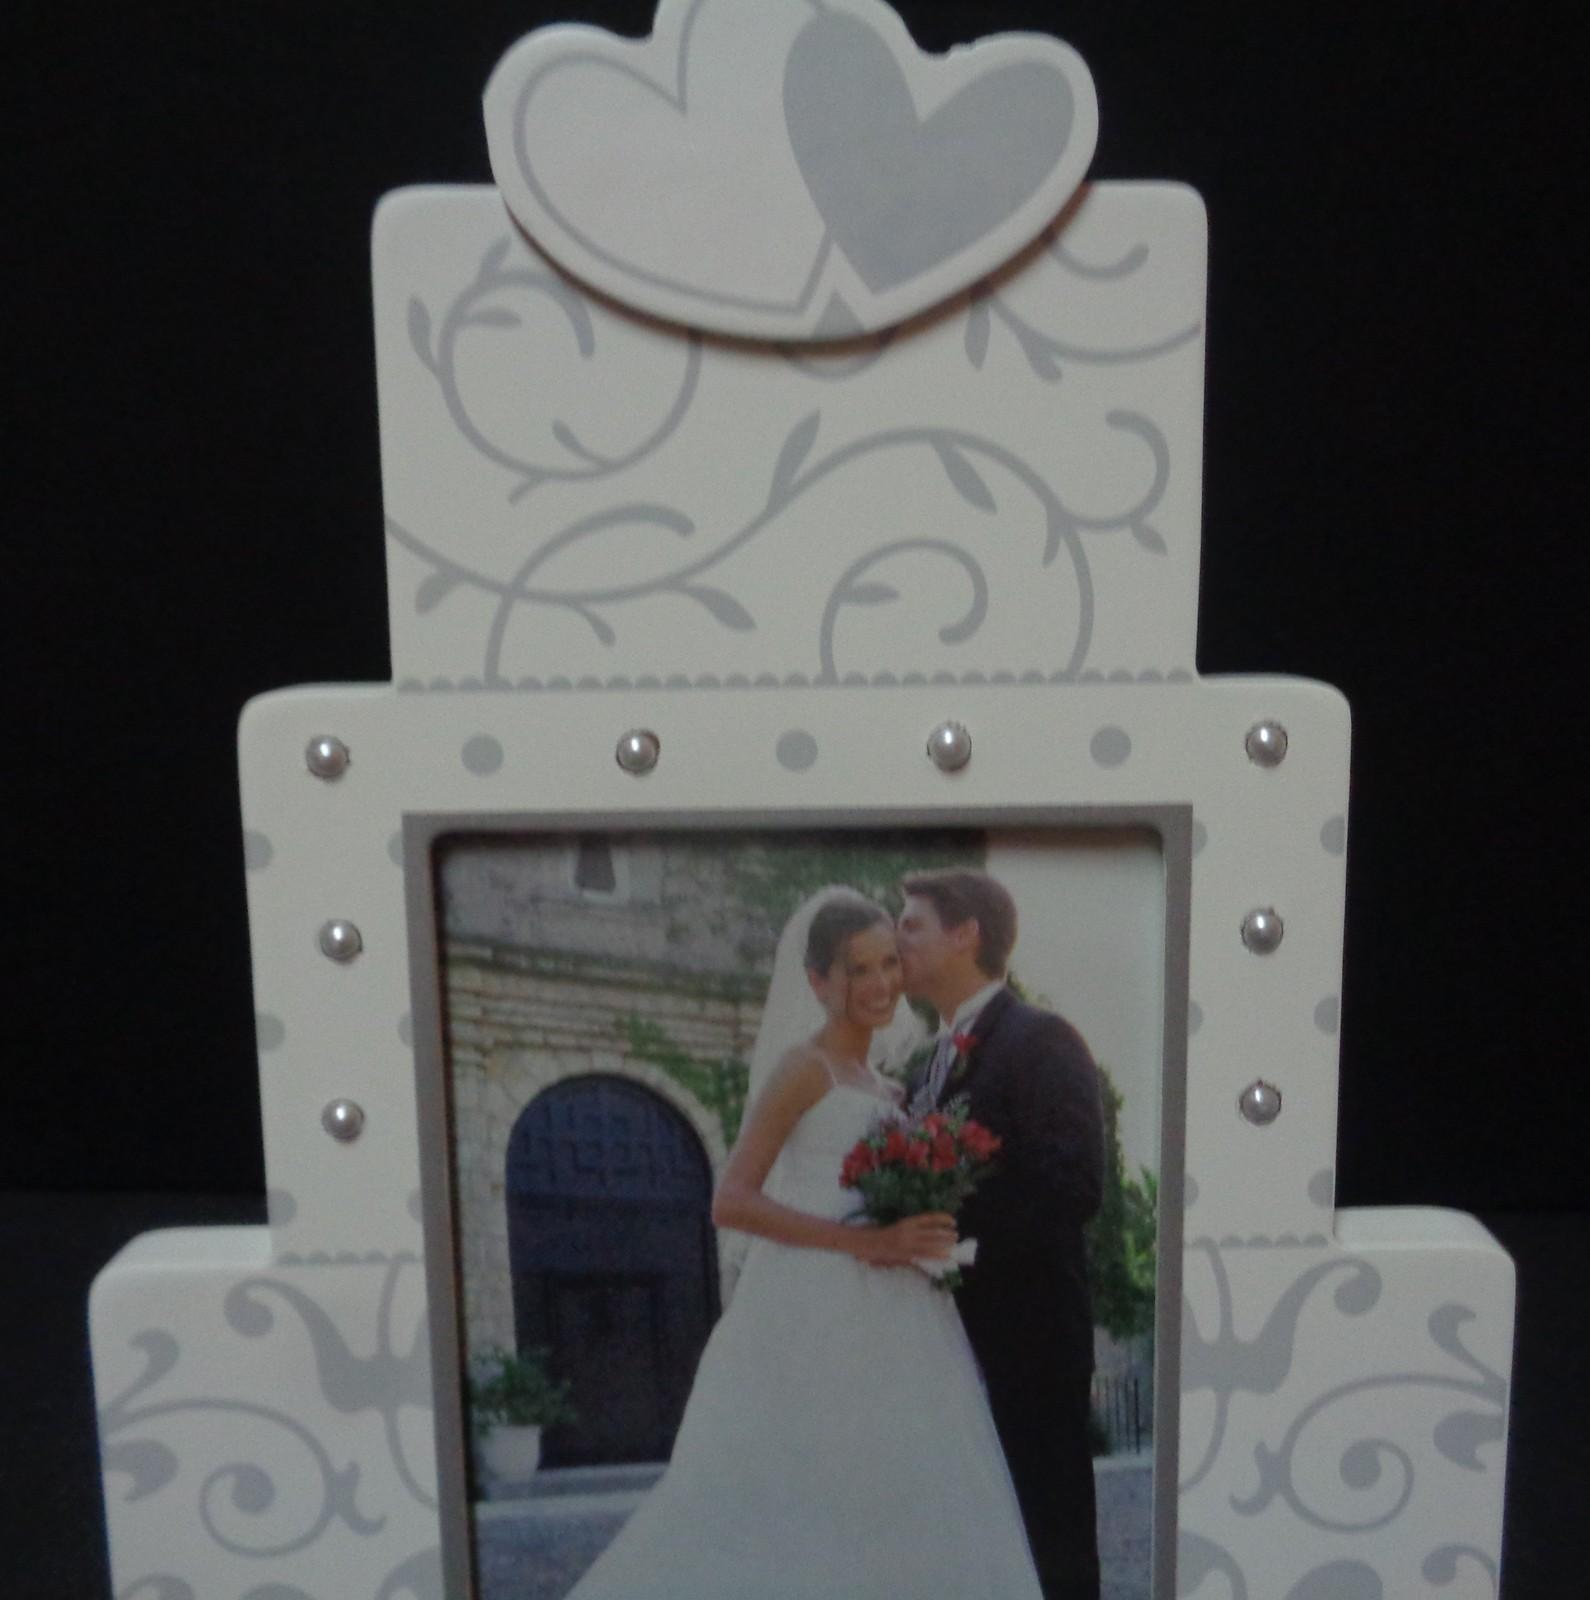 Our Wedding Day Wood Photo Frame Cake NWT Malden 4 x 6 photo